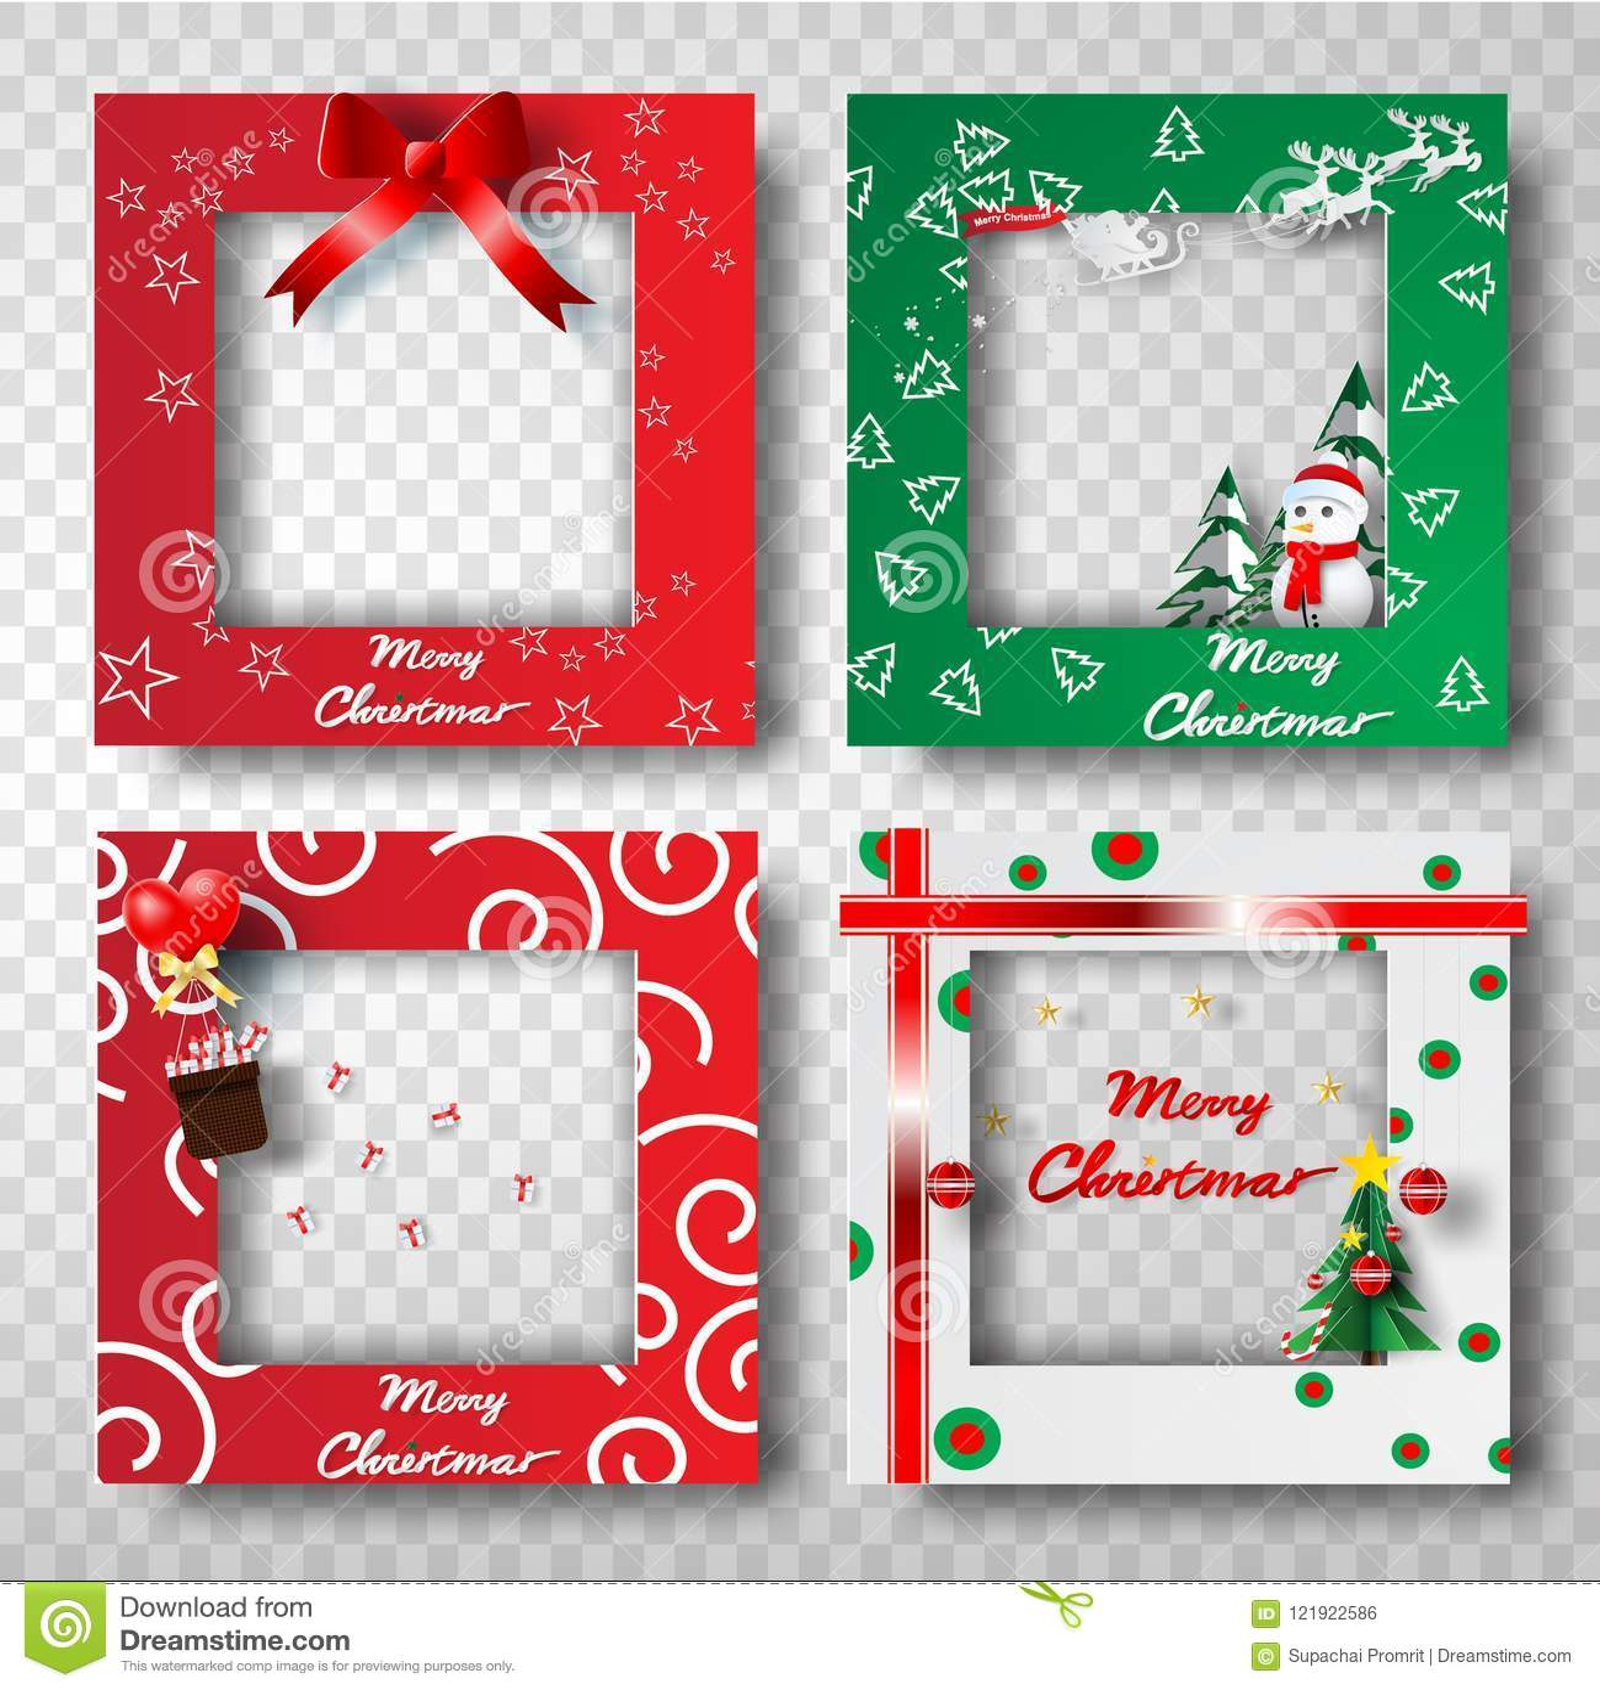 Paper Art And Craft Of Christmas Border Frame Photo Design Set T